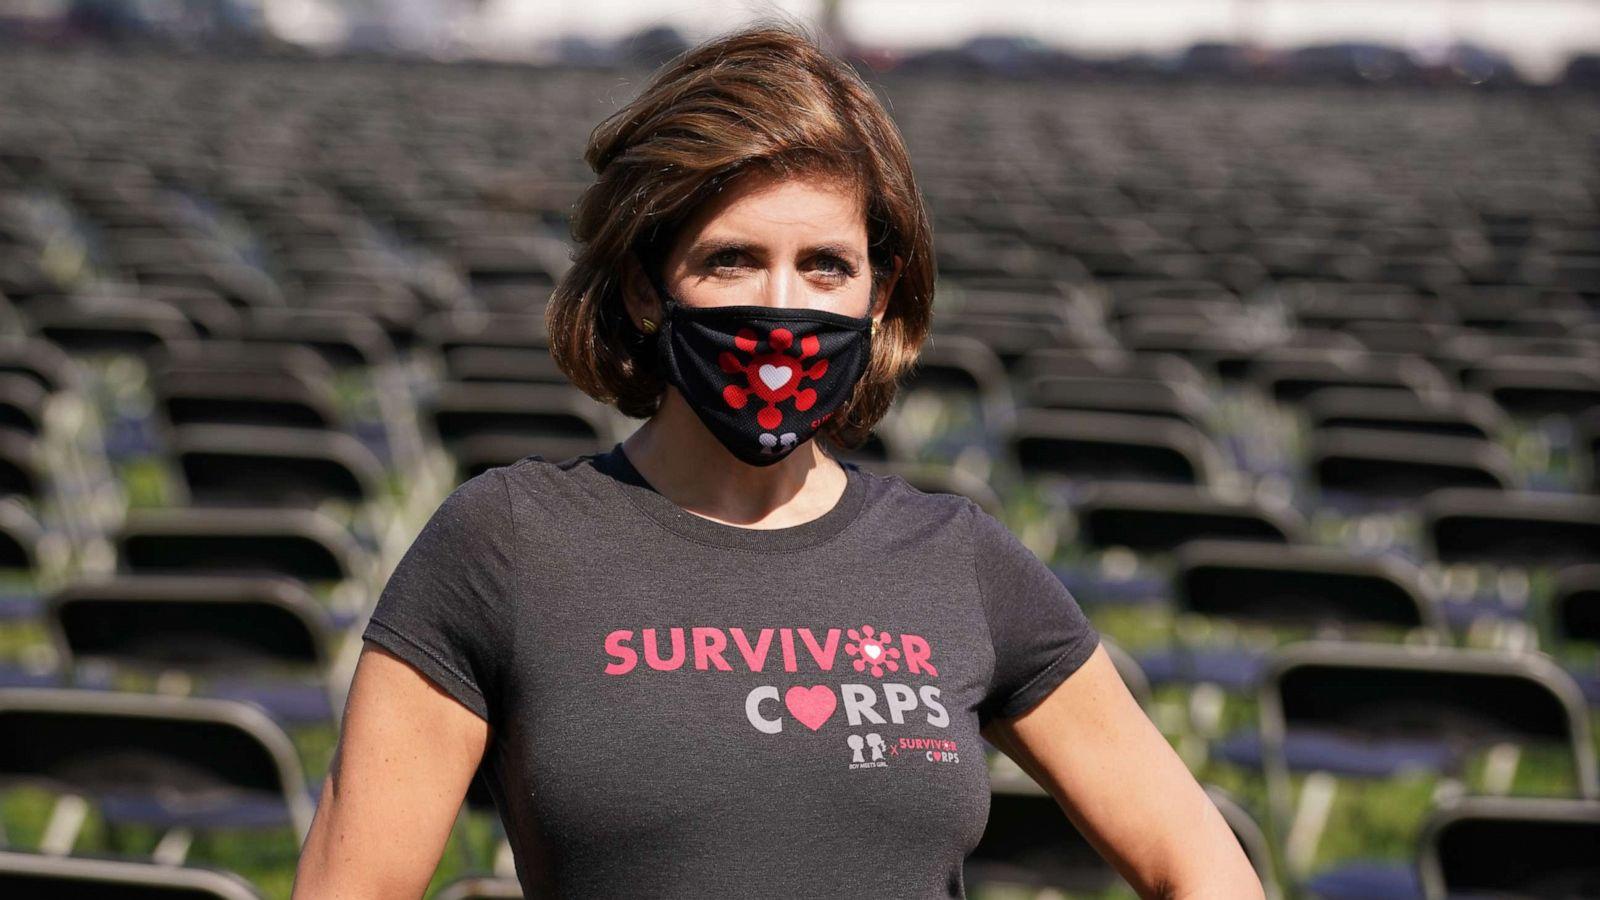 Survivor Corps